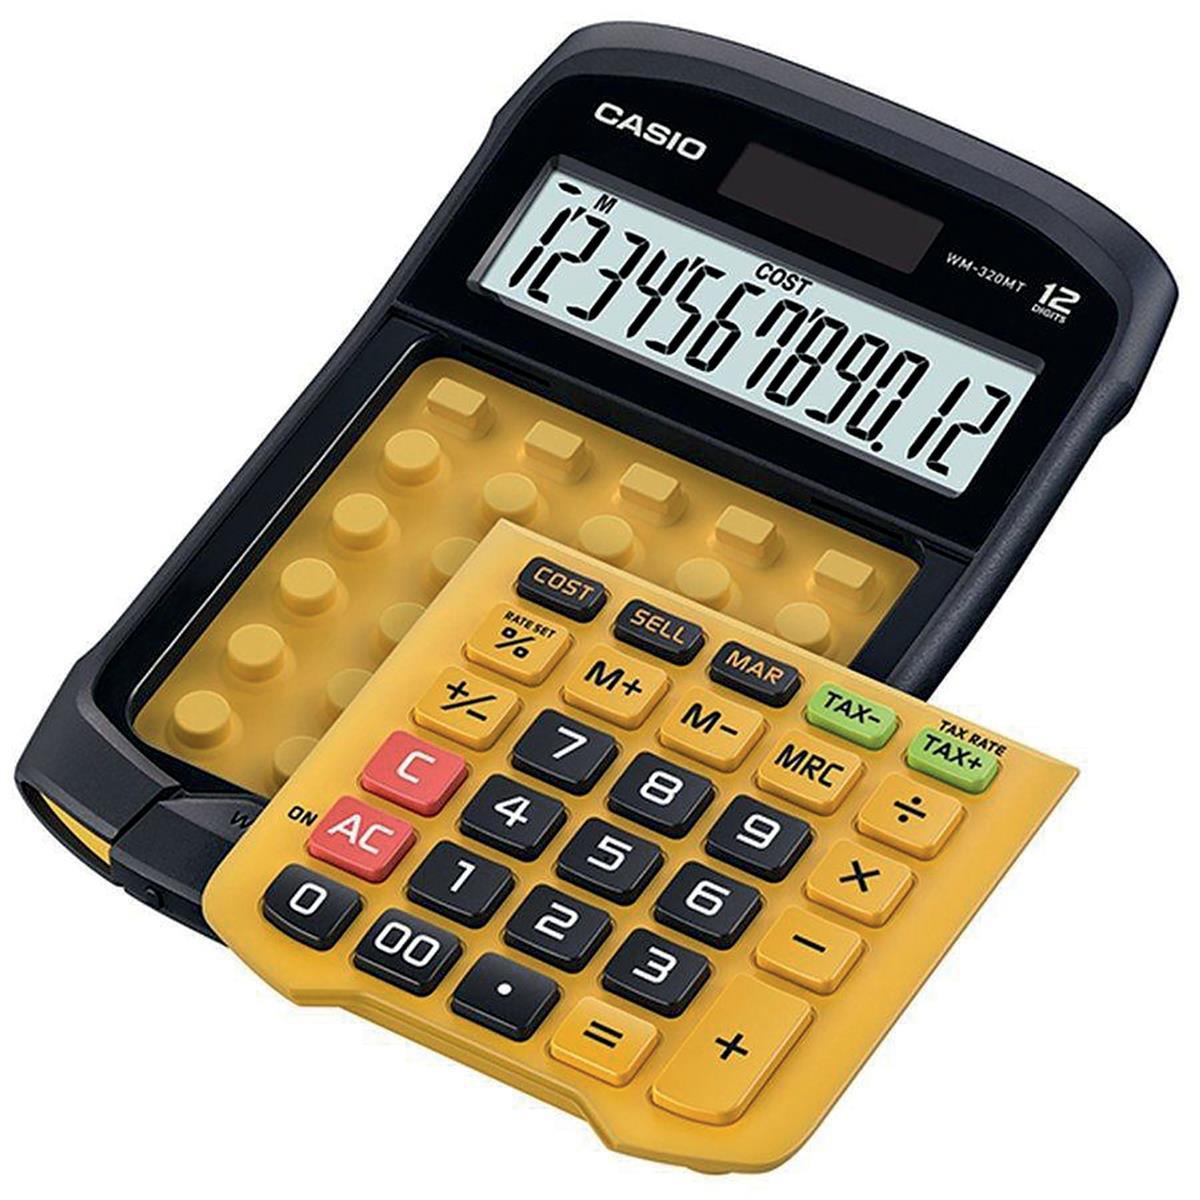 Casio Waterproof Calculator 12 Digit 3 Key Memory Battery/Solar 109x33x169mm Black/Yellow Ref WM-320MT